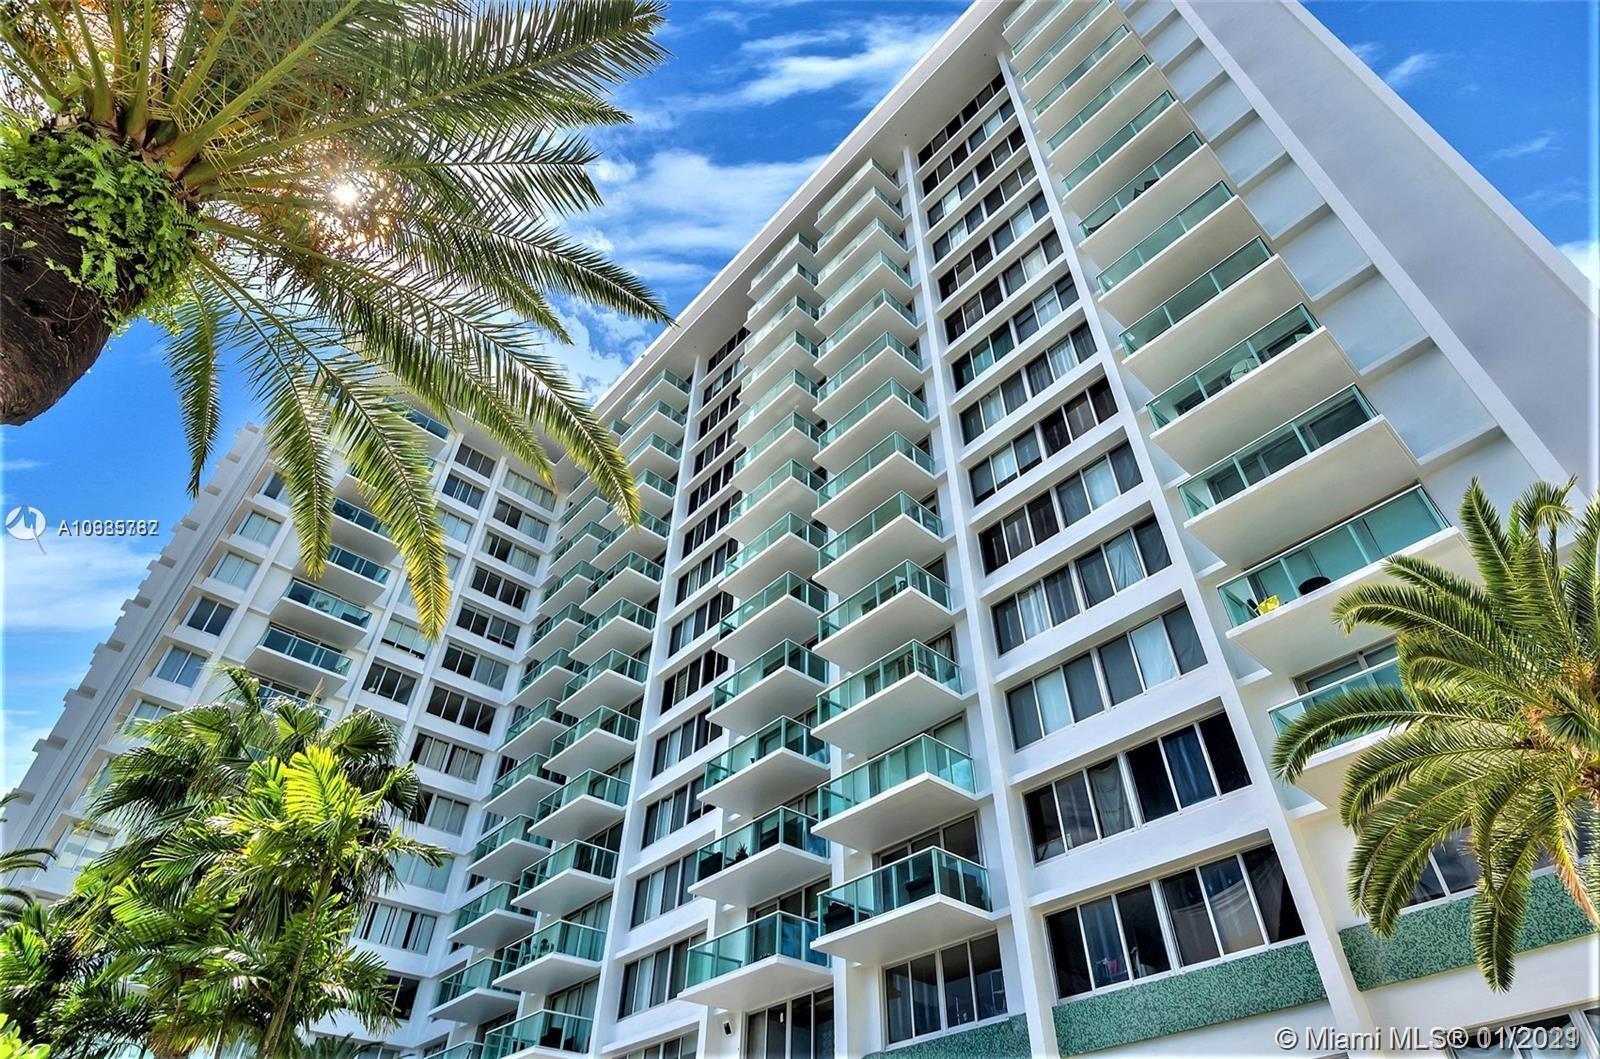 1BR/1BA Direct Bay-view unit; expansive vistas of Miami Beach, Miami Skyline and Star Island. NEW Im